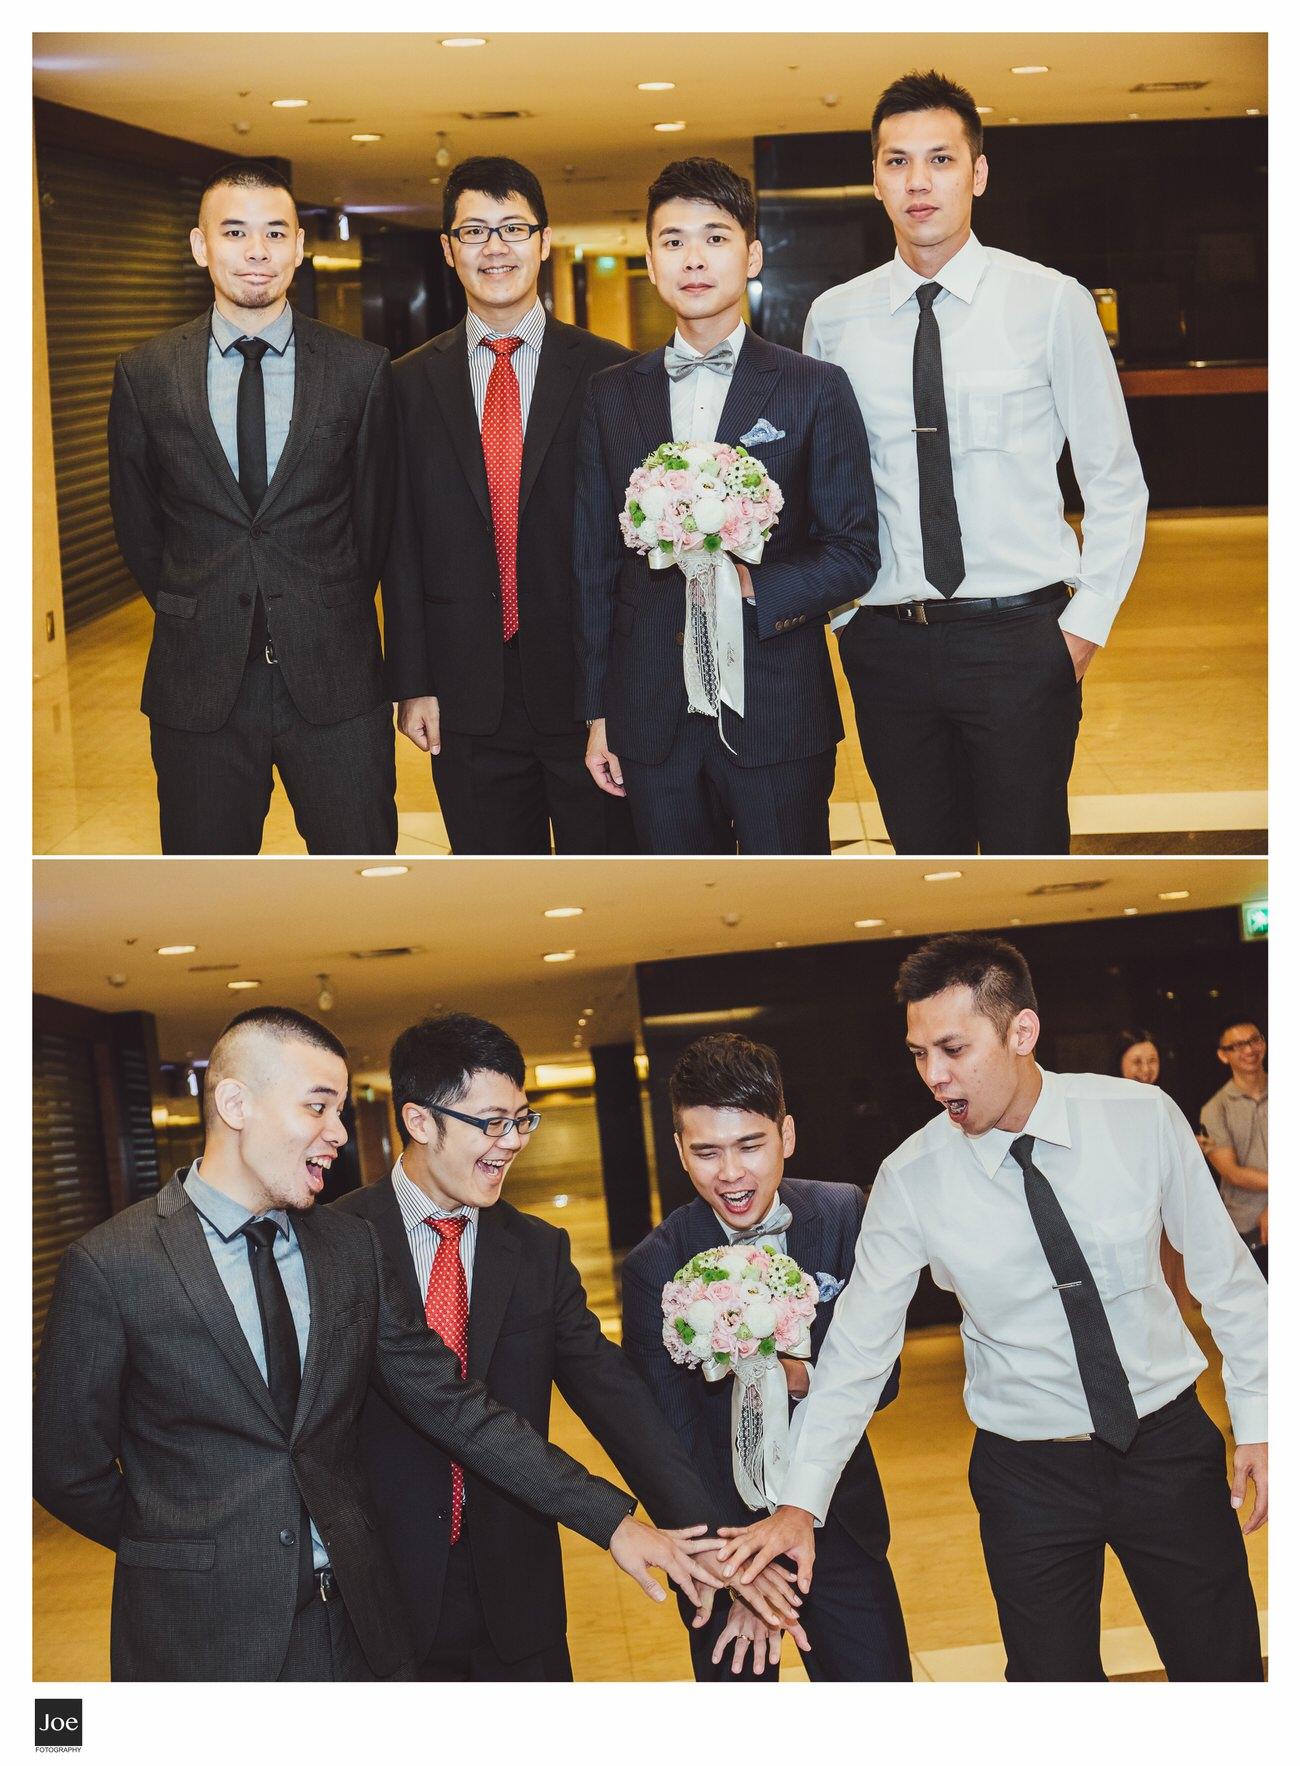 sunworld-dynasty-hotel-taipei-wedding-photo-joe-fotography-angel-jay-029.jpg